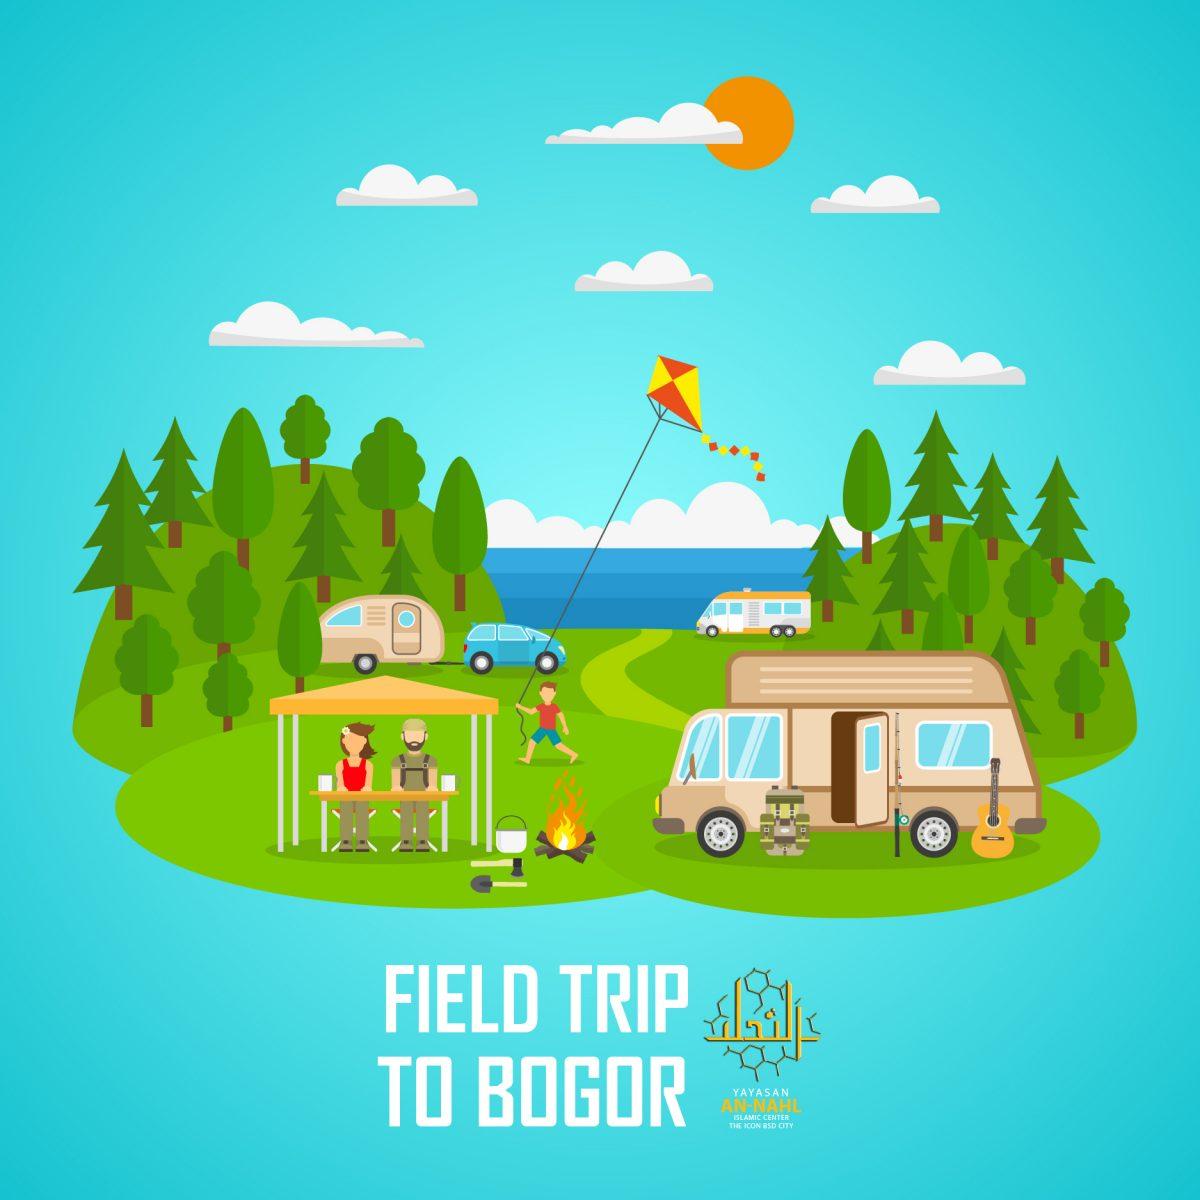 FIELD TRIP TO BOGOR